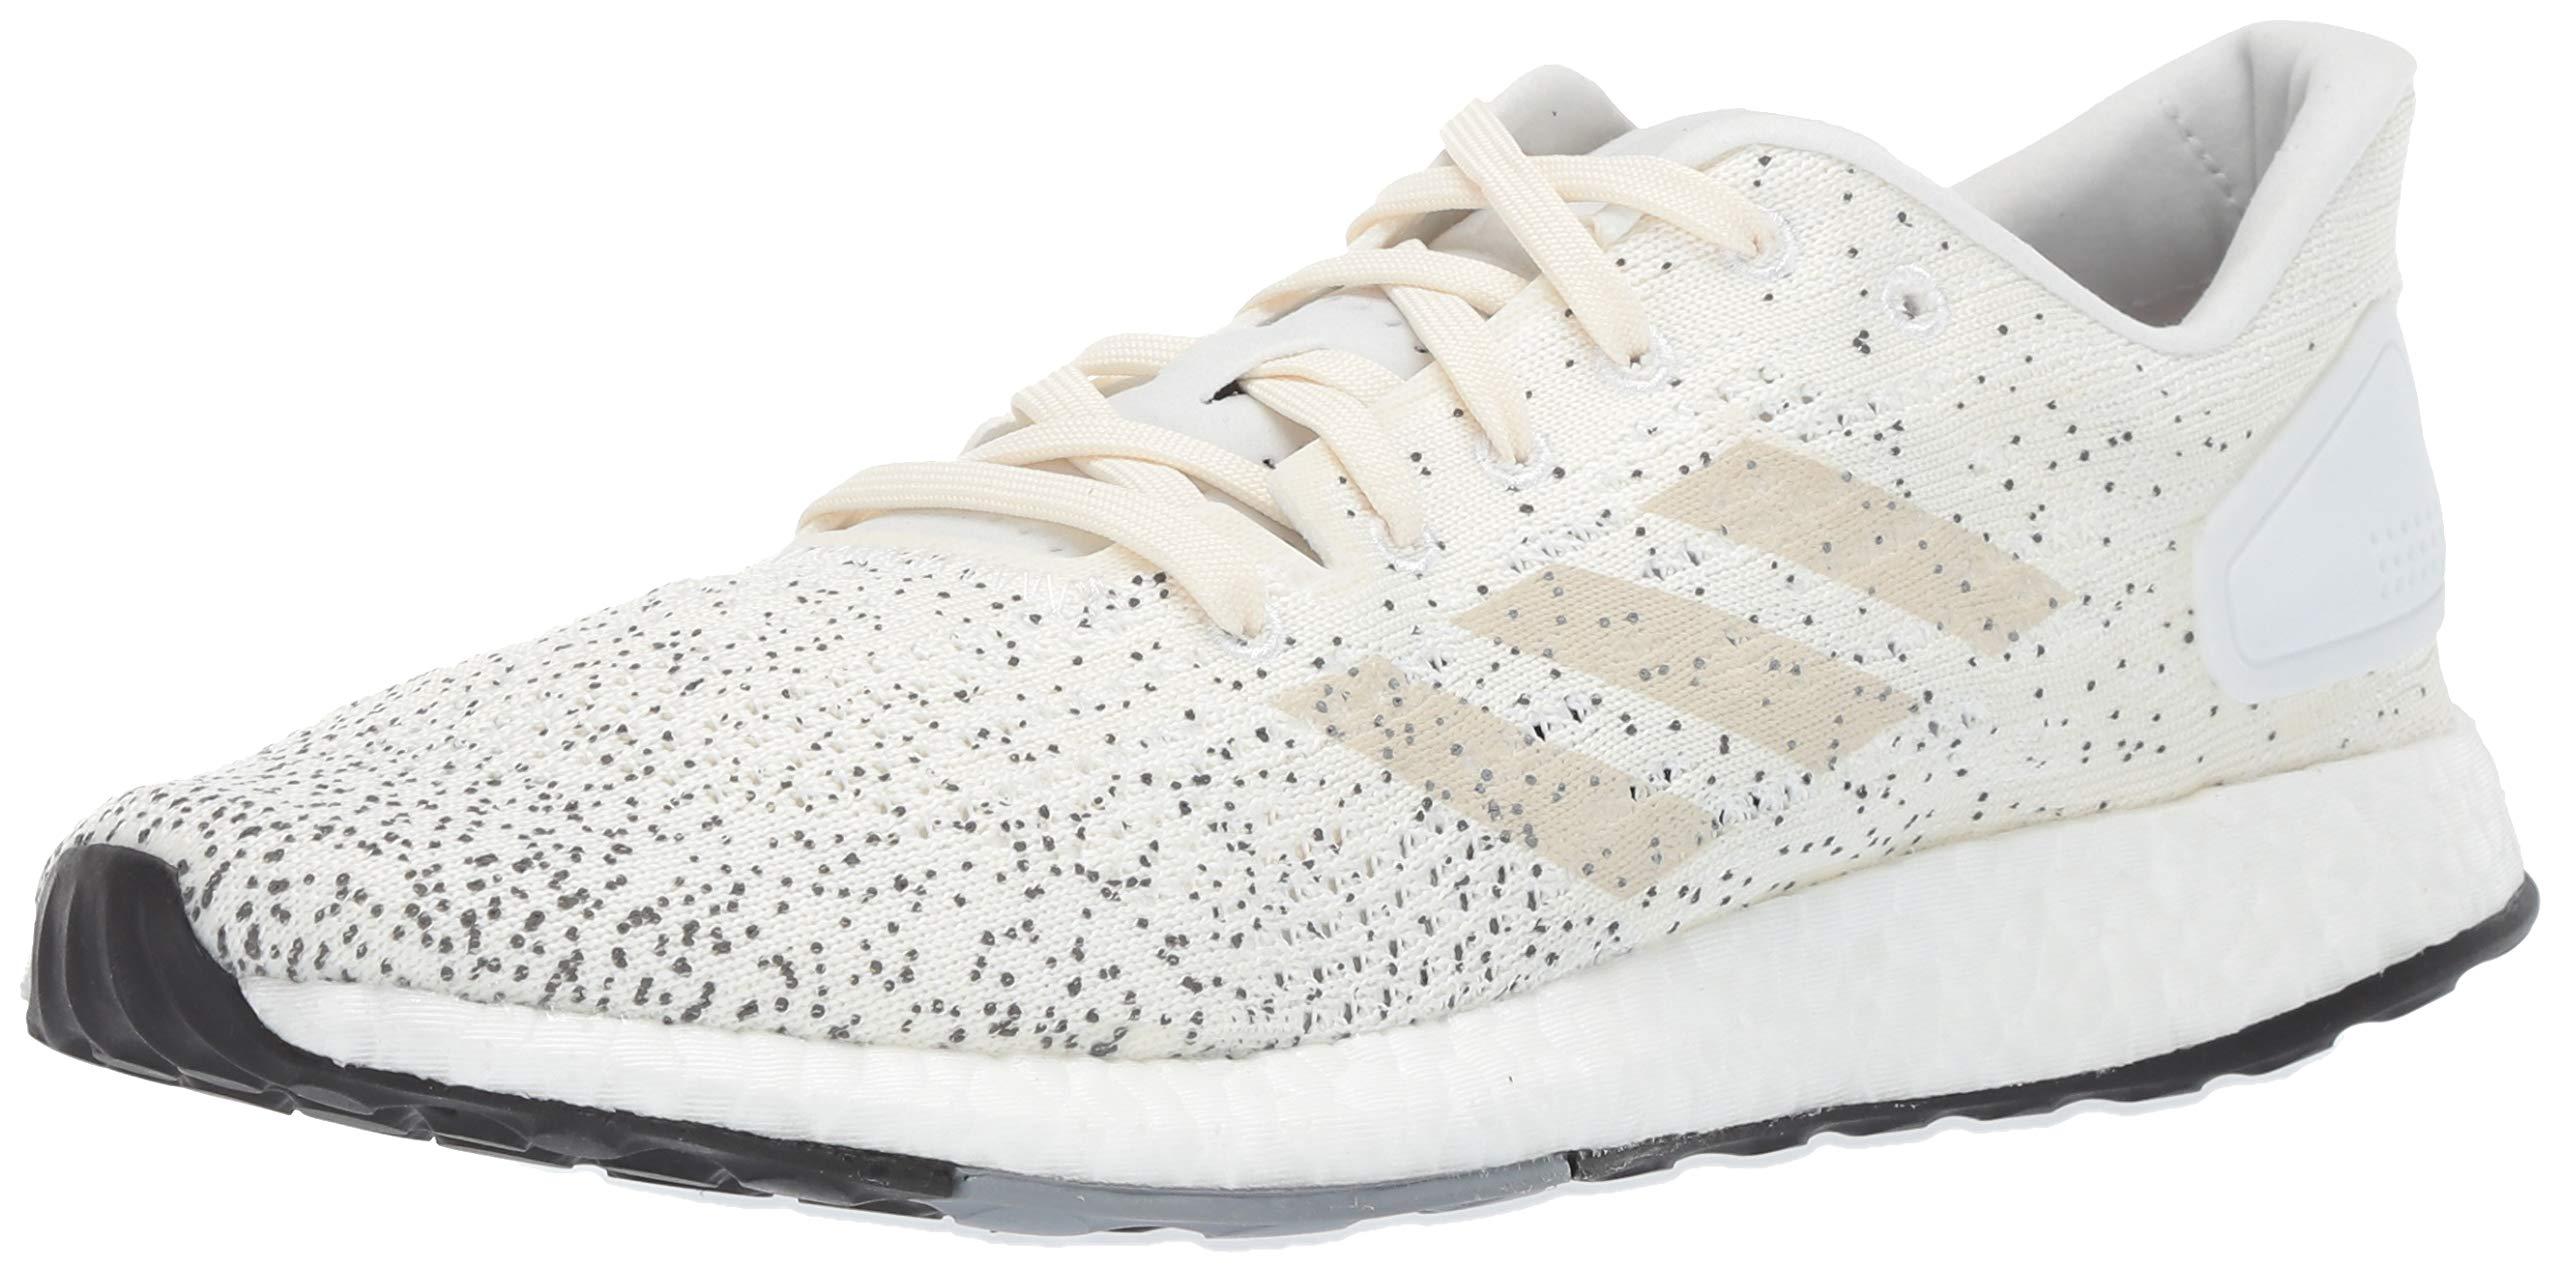 adidas Women's Pureboost DPR Running Shoes, raw White/Grey, 11 M US by adidas